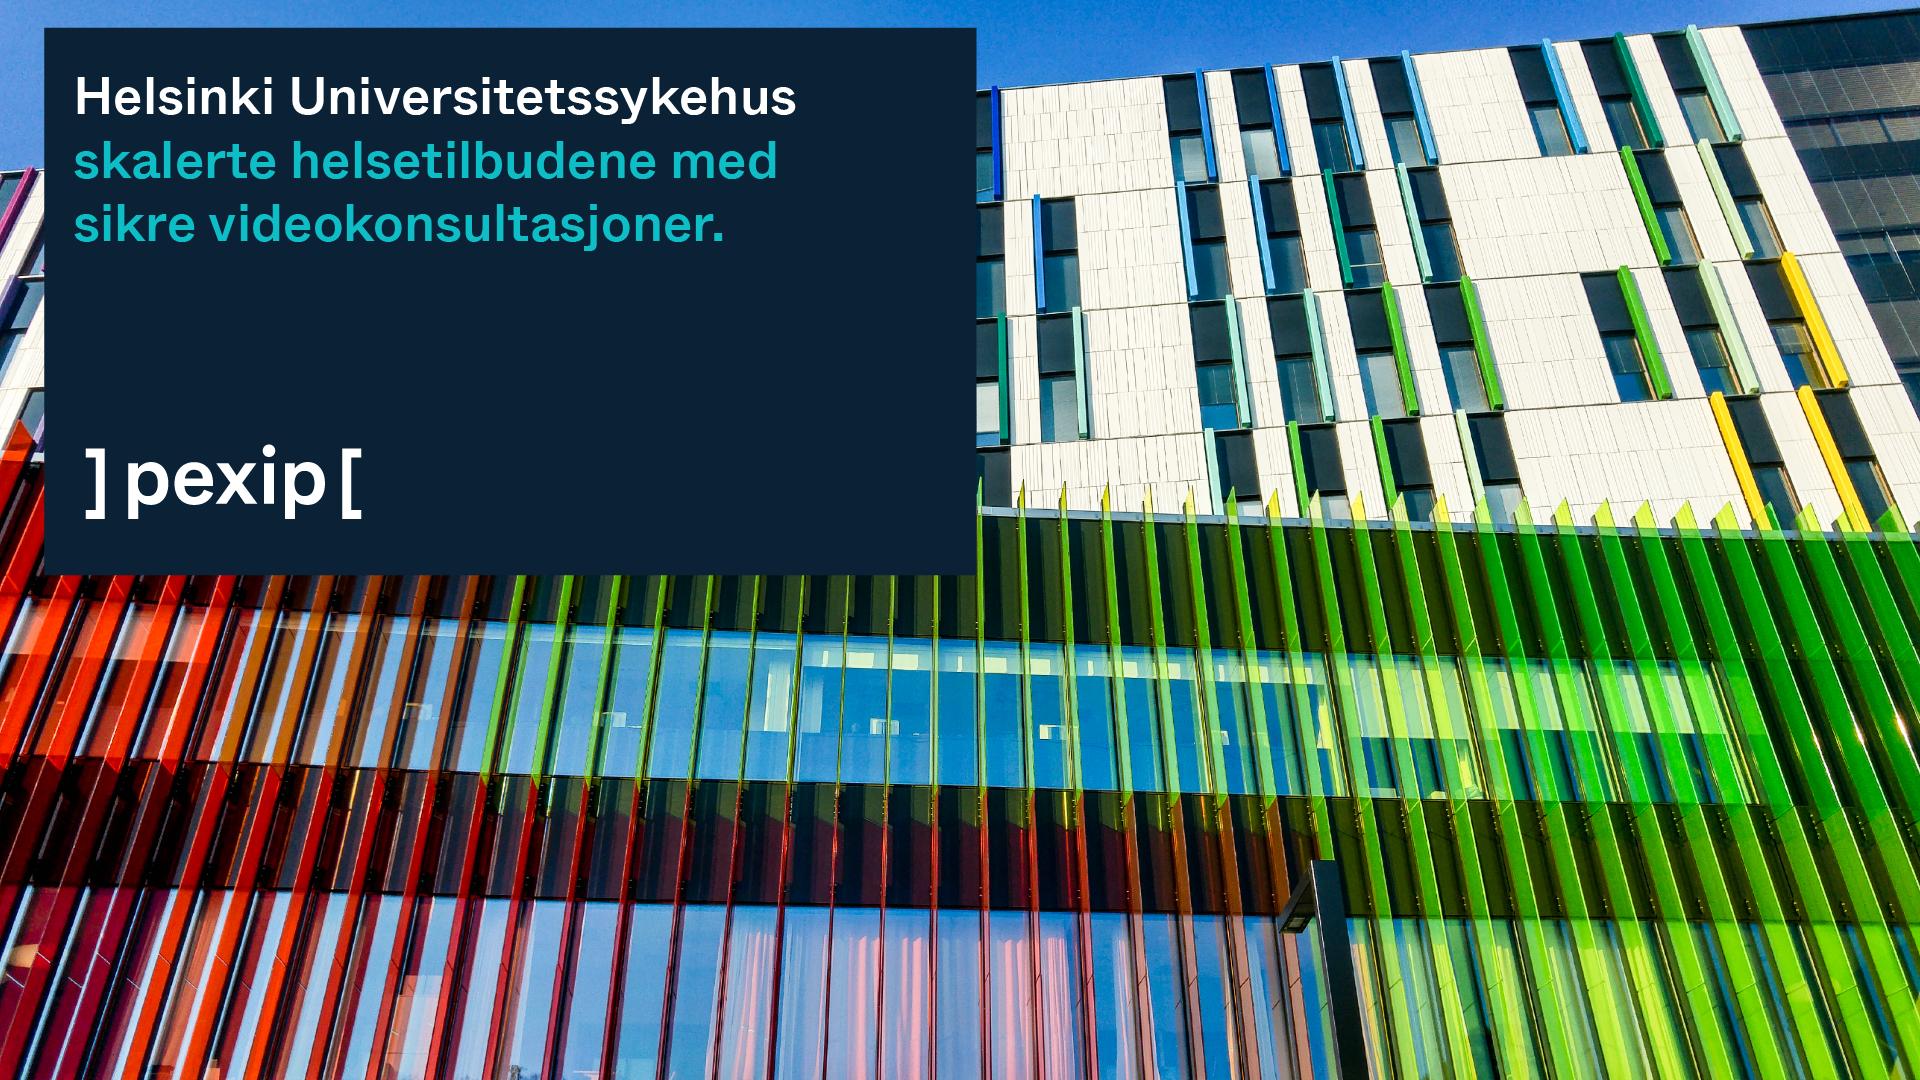 Helsinki Universitetssykehus